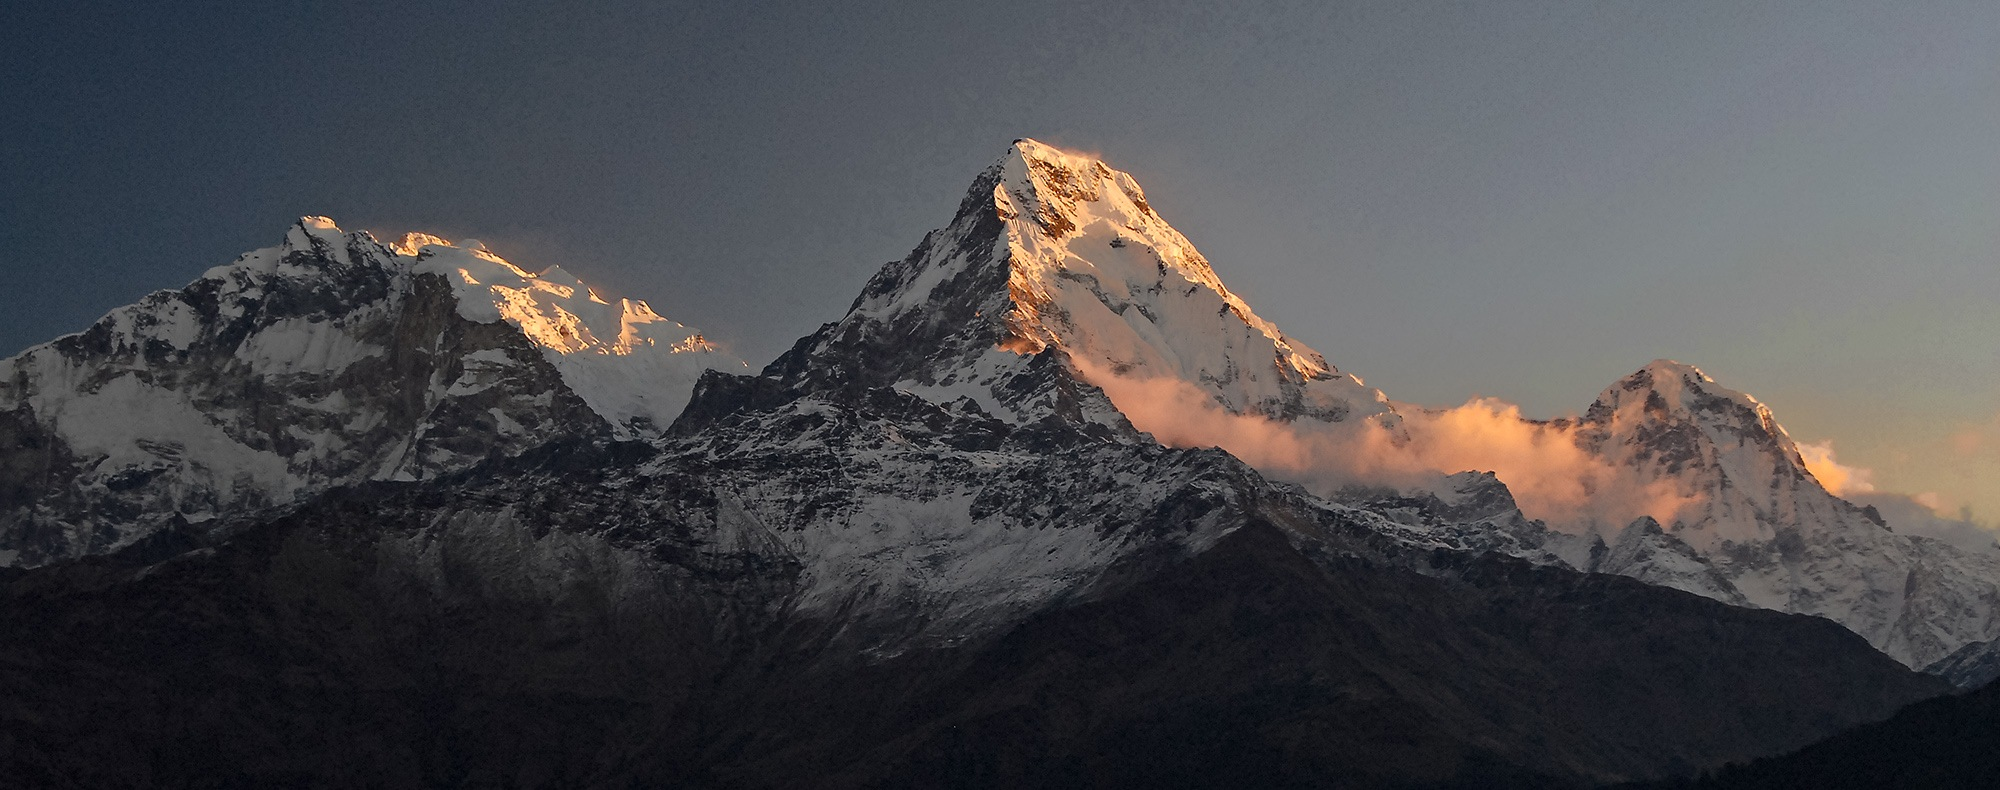 Annapurna Sud by Maurice Maccari